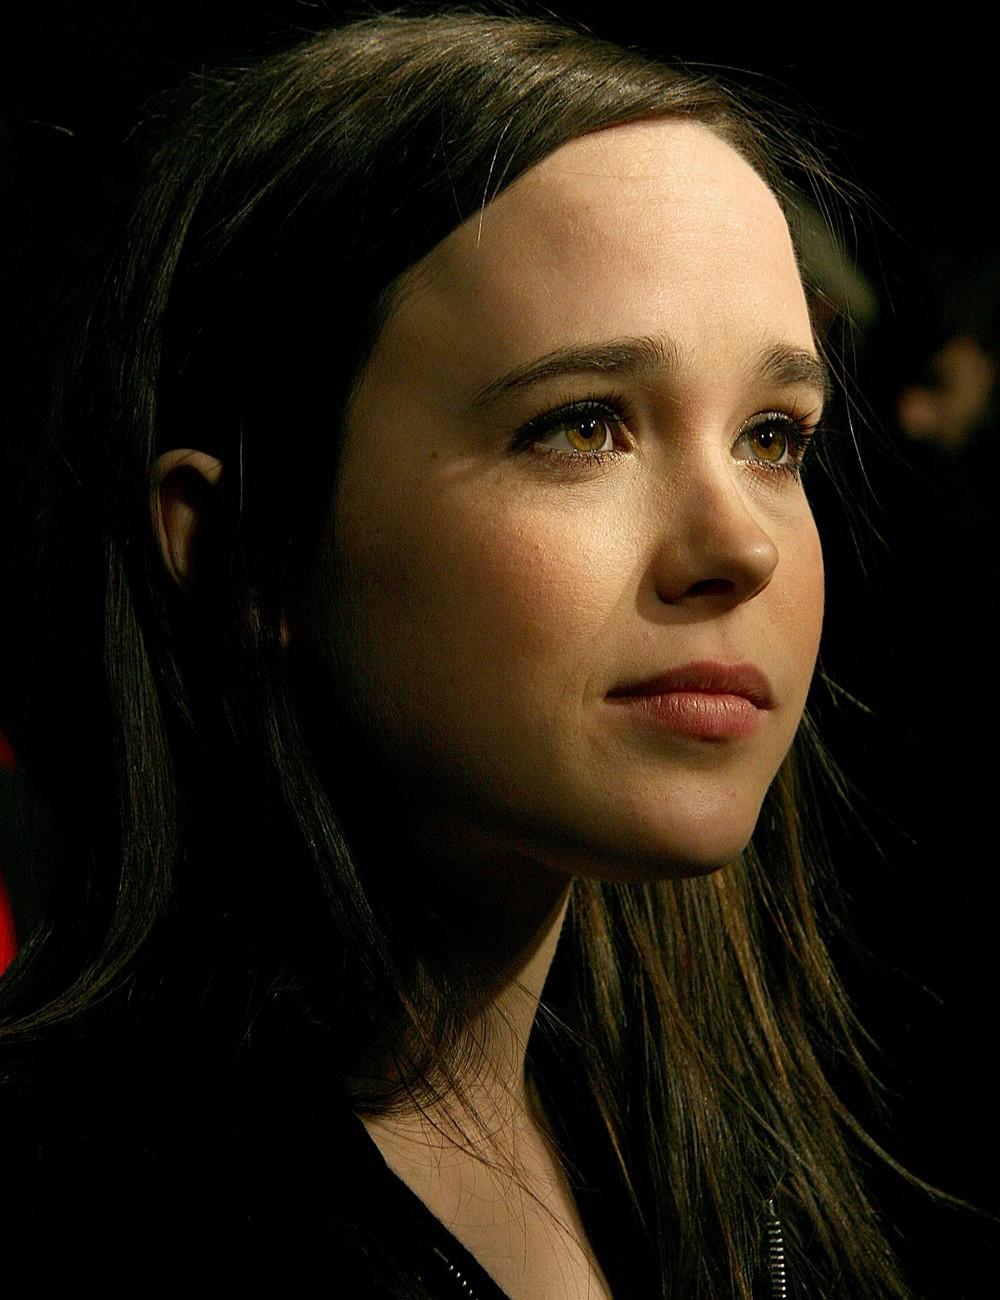 Ellen Page photo 34 of... Ellen Page Number